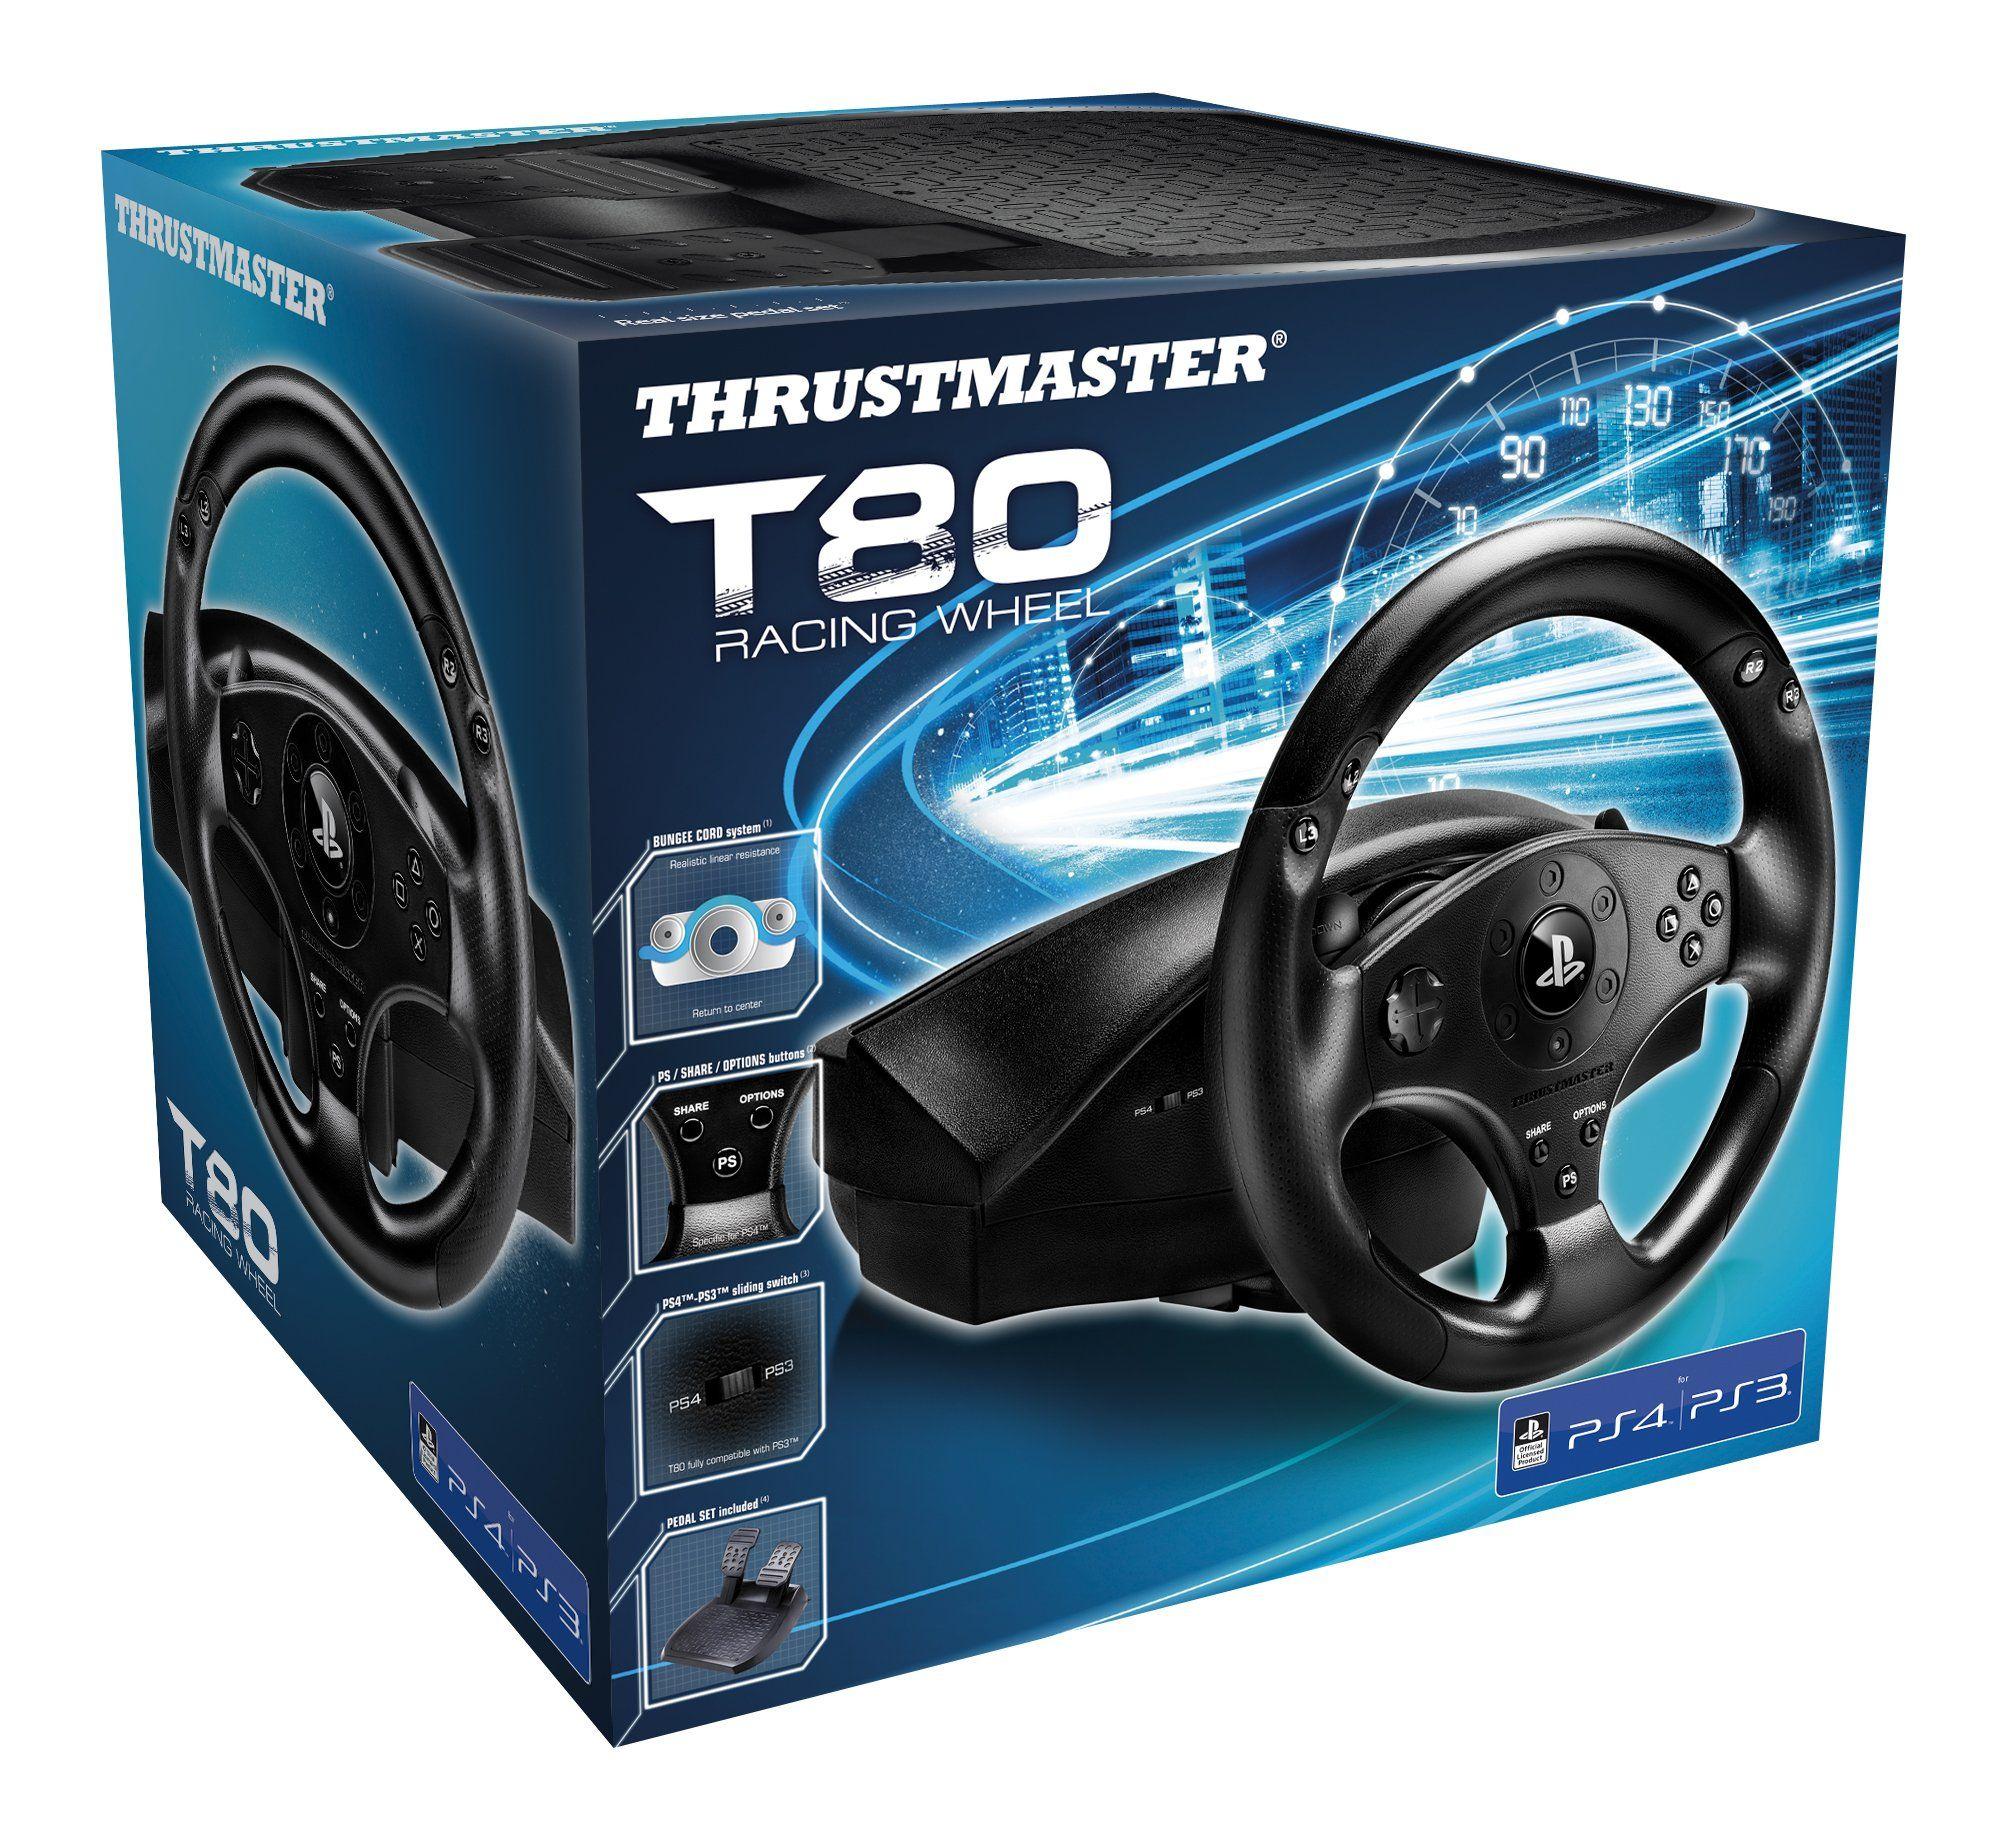 Thrustmaster T80 Racing Wheel PS4/PC,Racing,